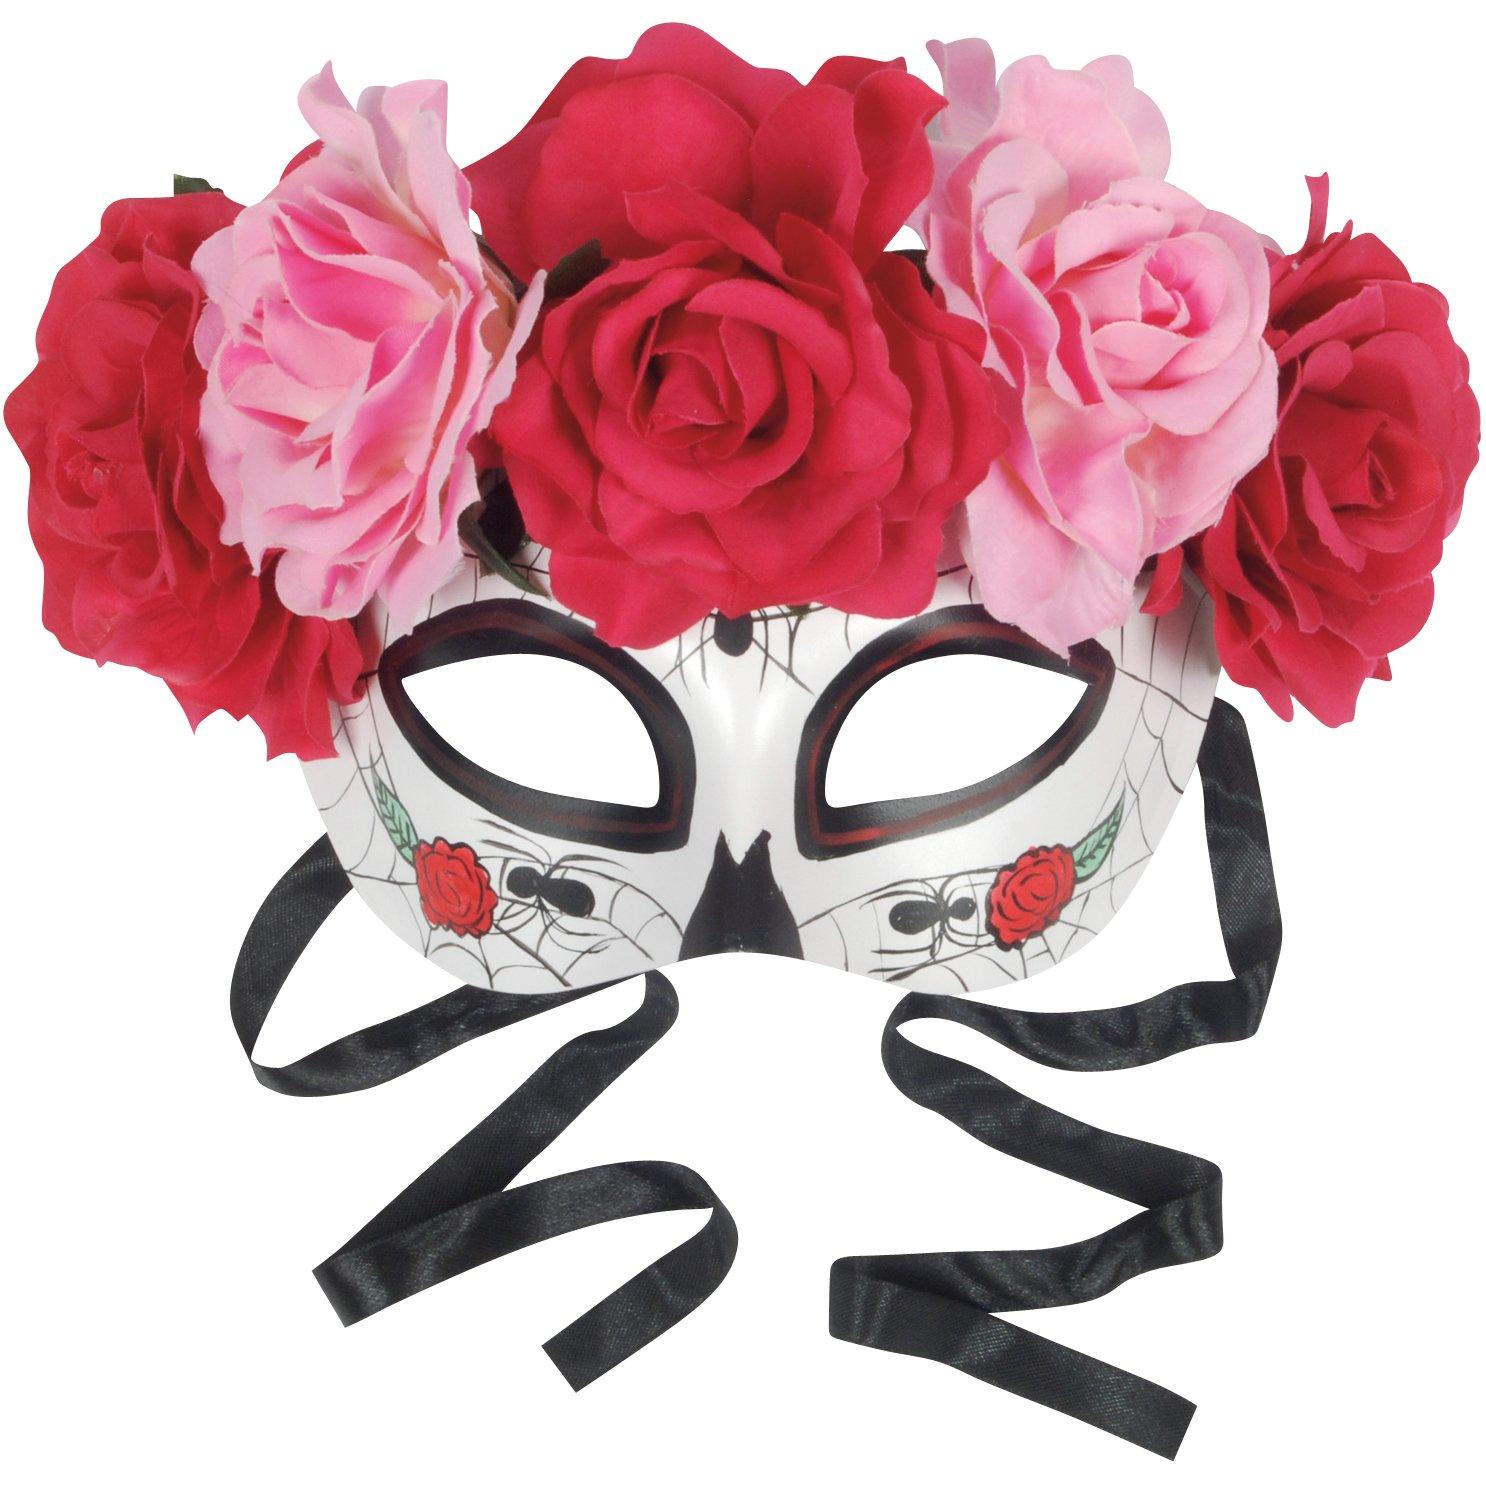 ویکالا · خرید  اصل اورجینال · خرید از آمازون · Loftus International Star Power Day of The Dead Sugar Skull Half Mask W Roses, White Multi, One-Size Novelty Item wekala · ویکالا